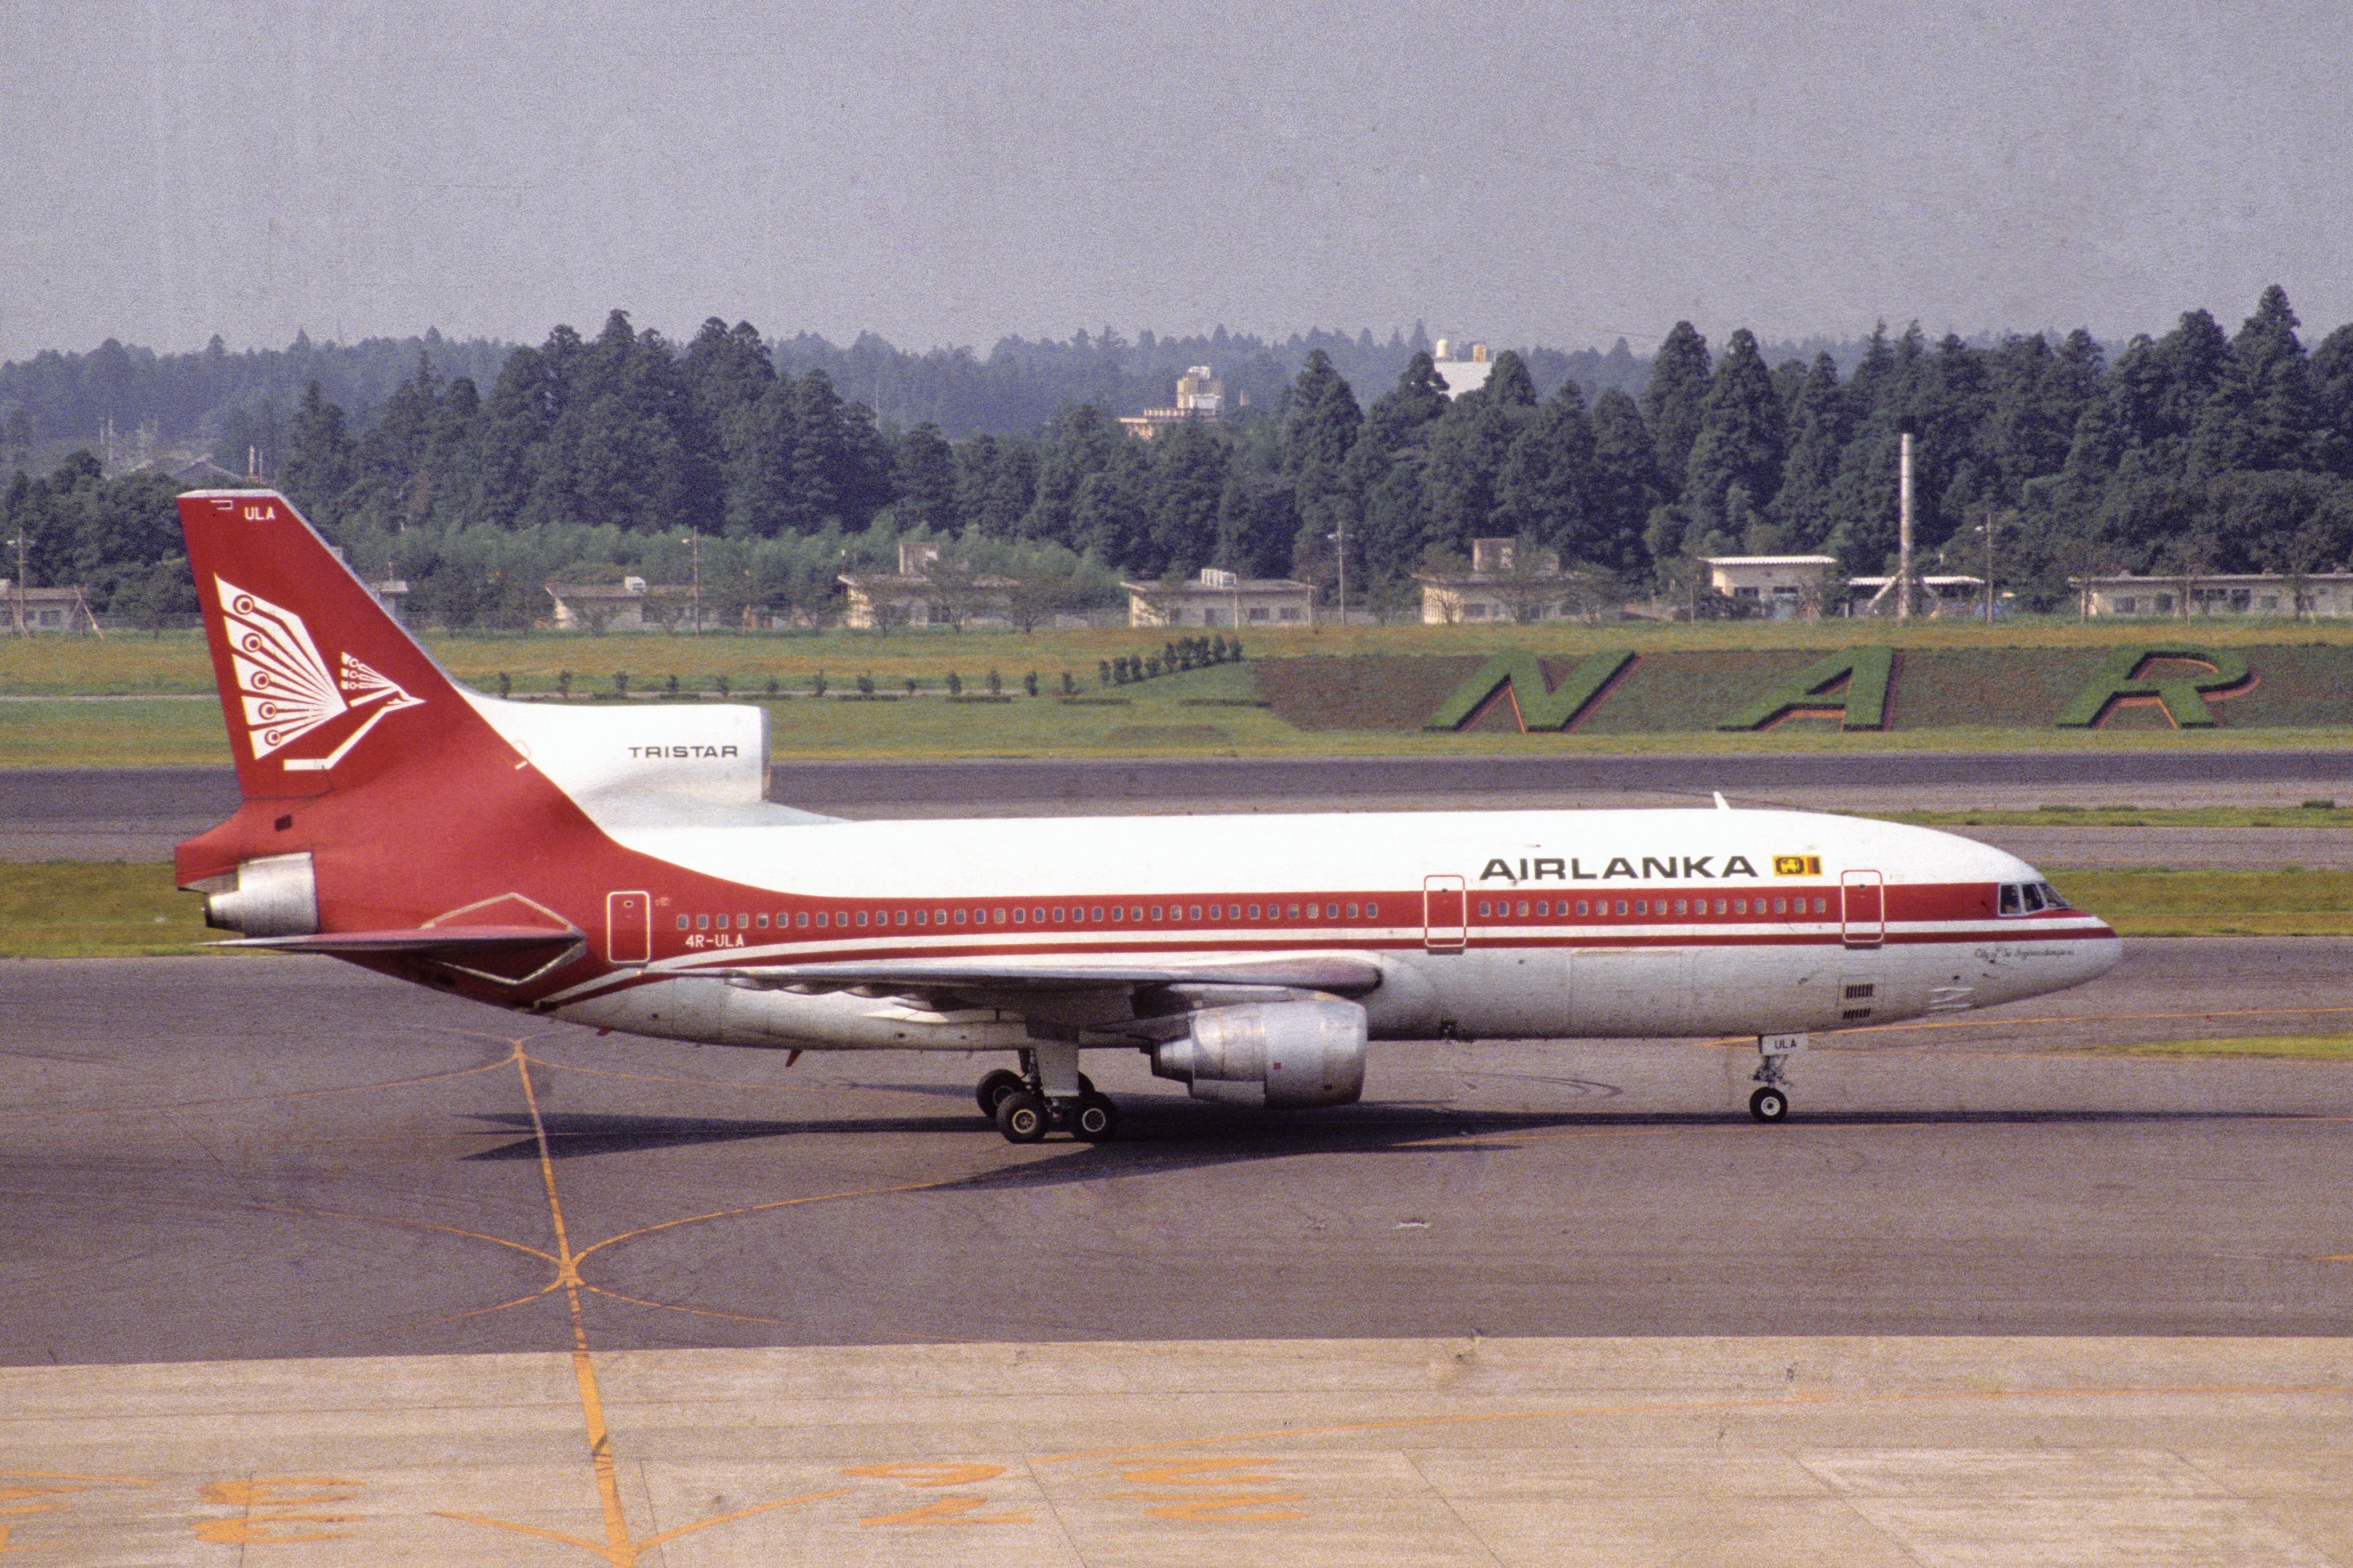 File:Air Lanka Lockheed L-1011 TriStar 500 (4R-ULA 1235)